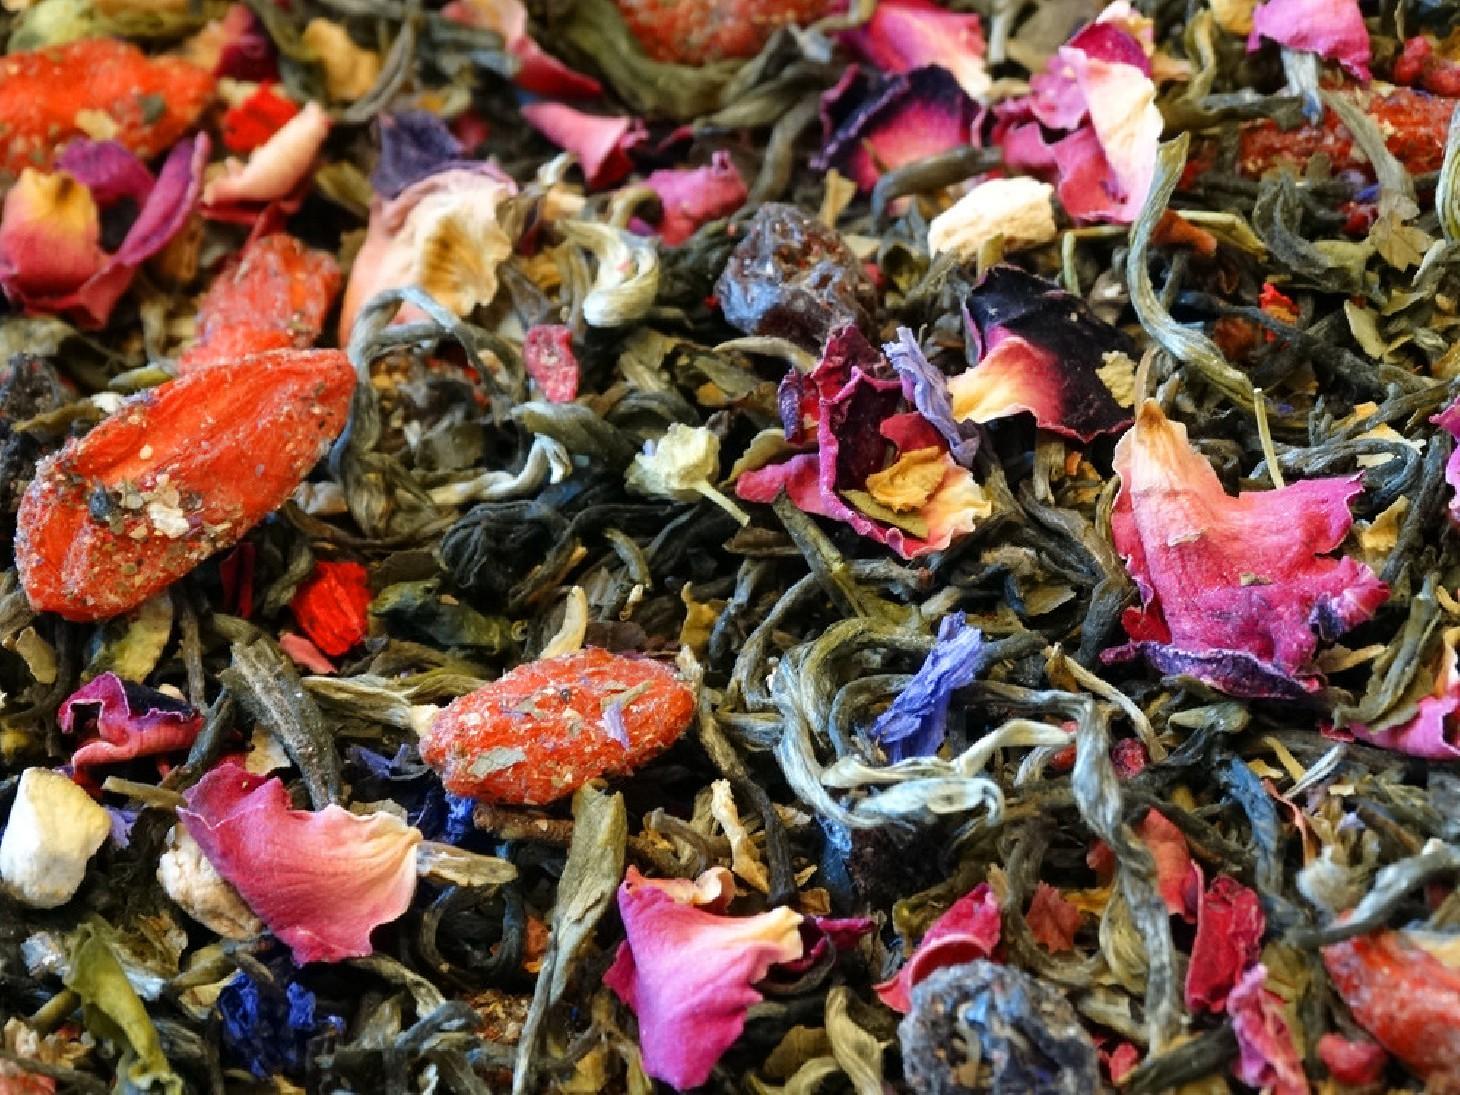 White Tea, Goji, Raspberry, Citrus, Grape, Petals